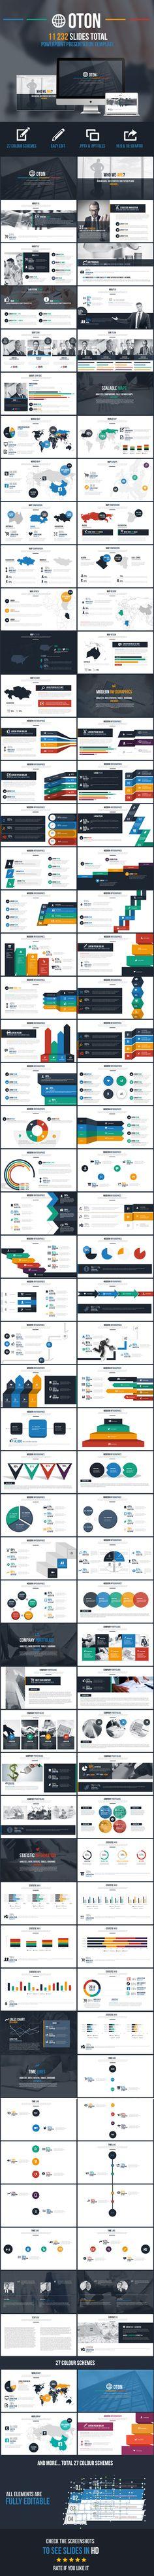 Oton Powerpoint Presentation Template #slides #design Download: http://graphicriver.net/item/oton-powerpoint-presentation-template/10949220?ref=ksioks